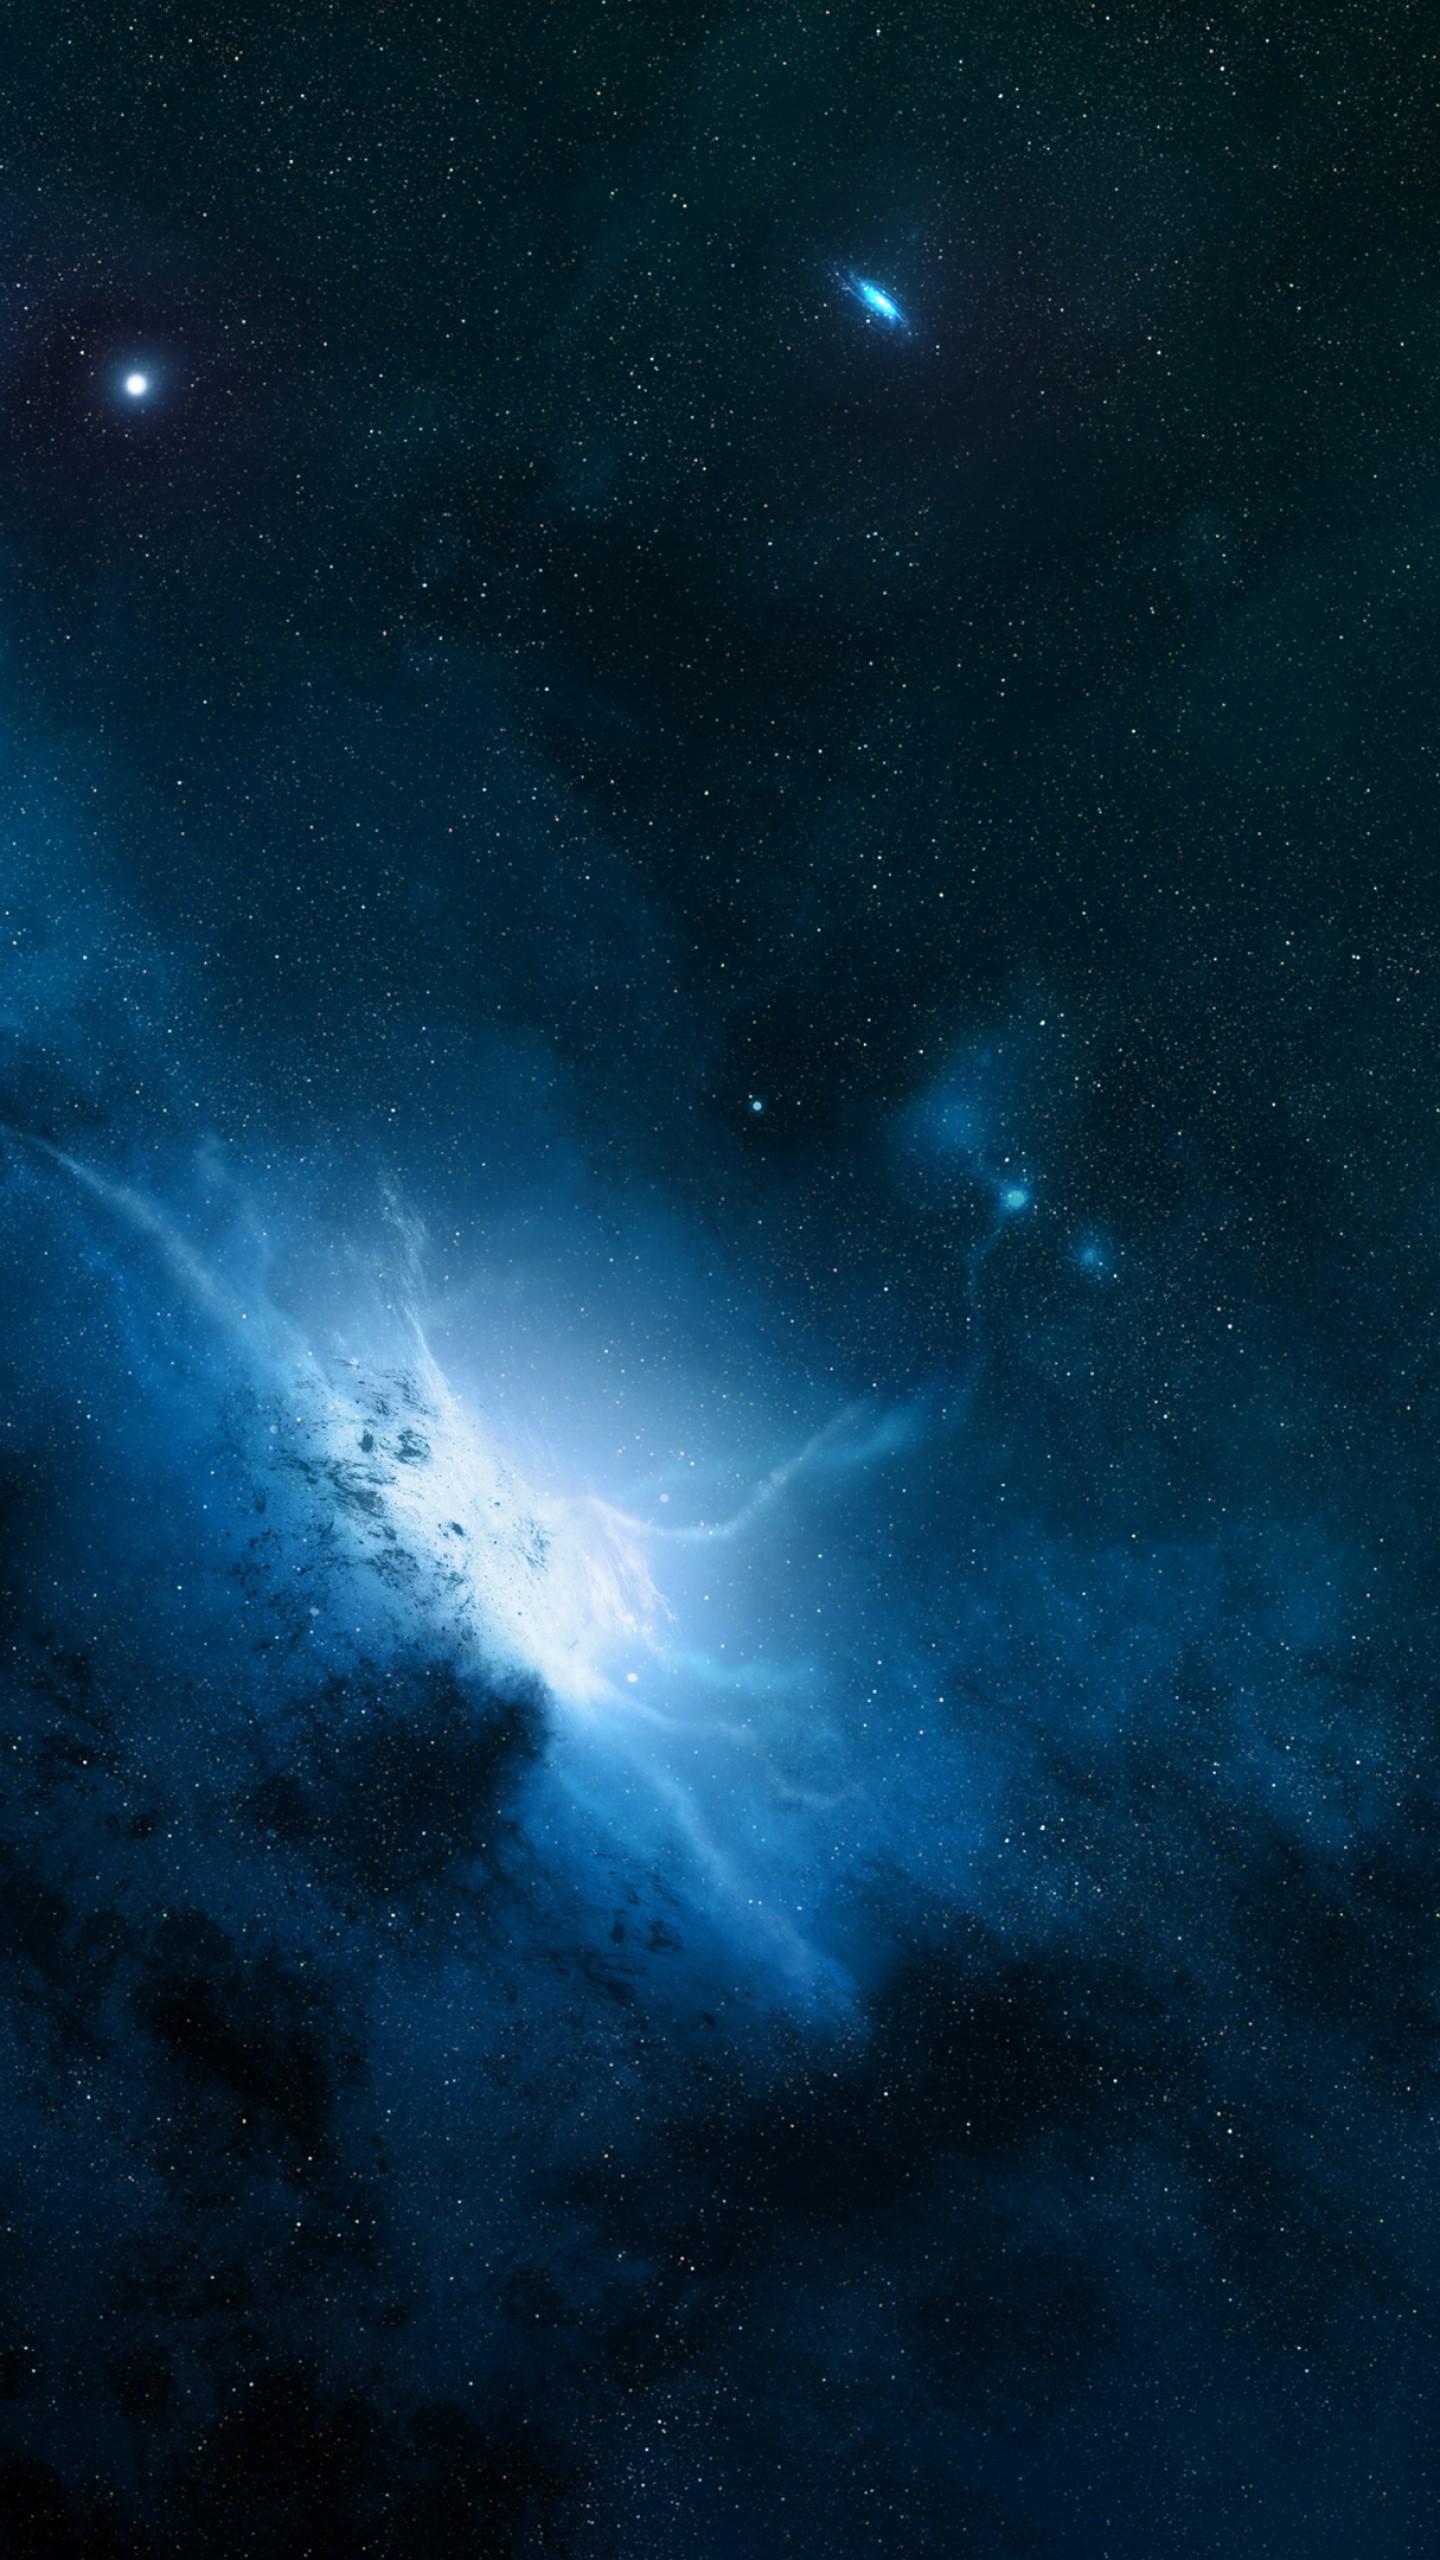 Wallpaper Nebula Space Stars Andromeda Space 5504